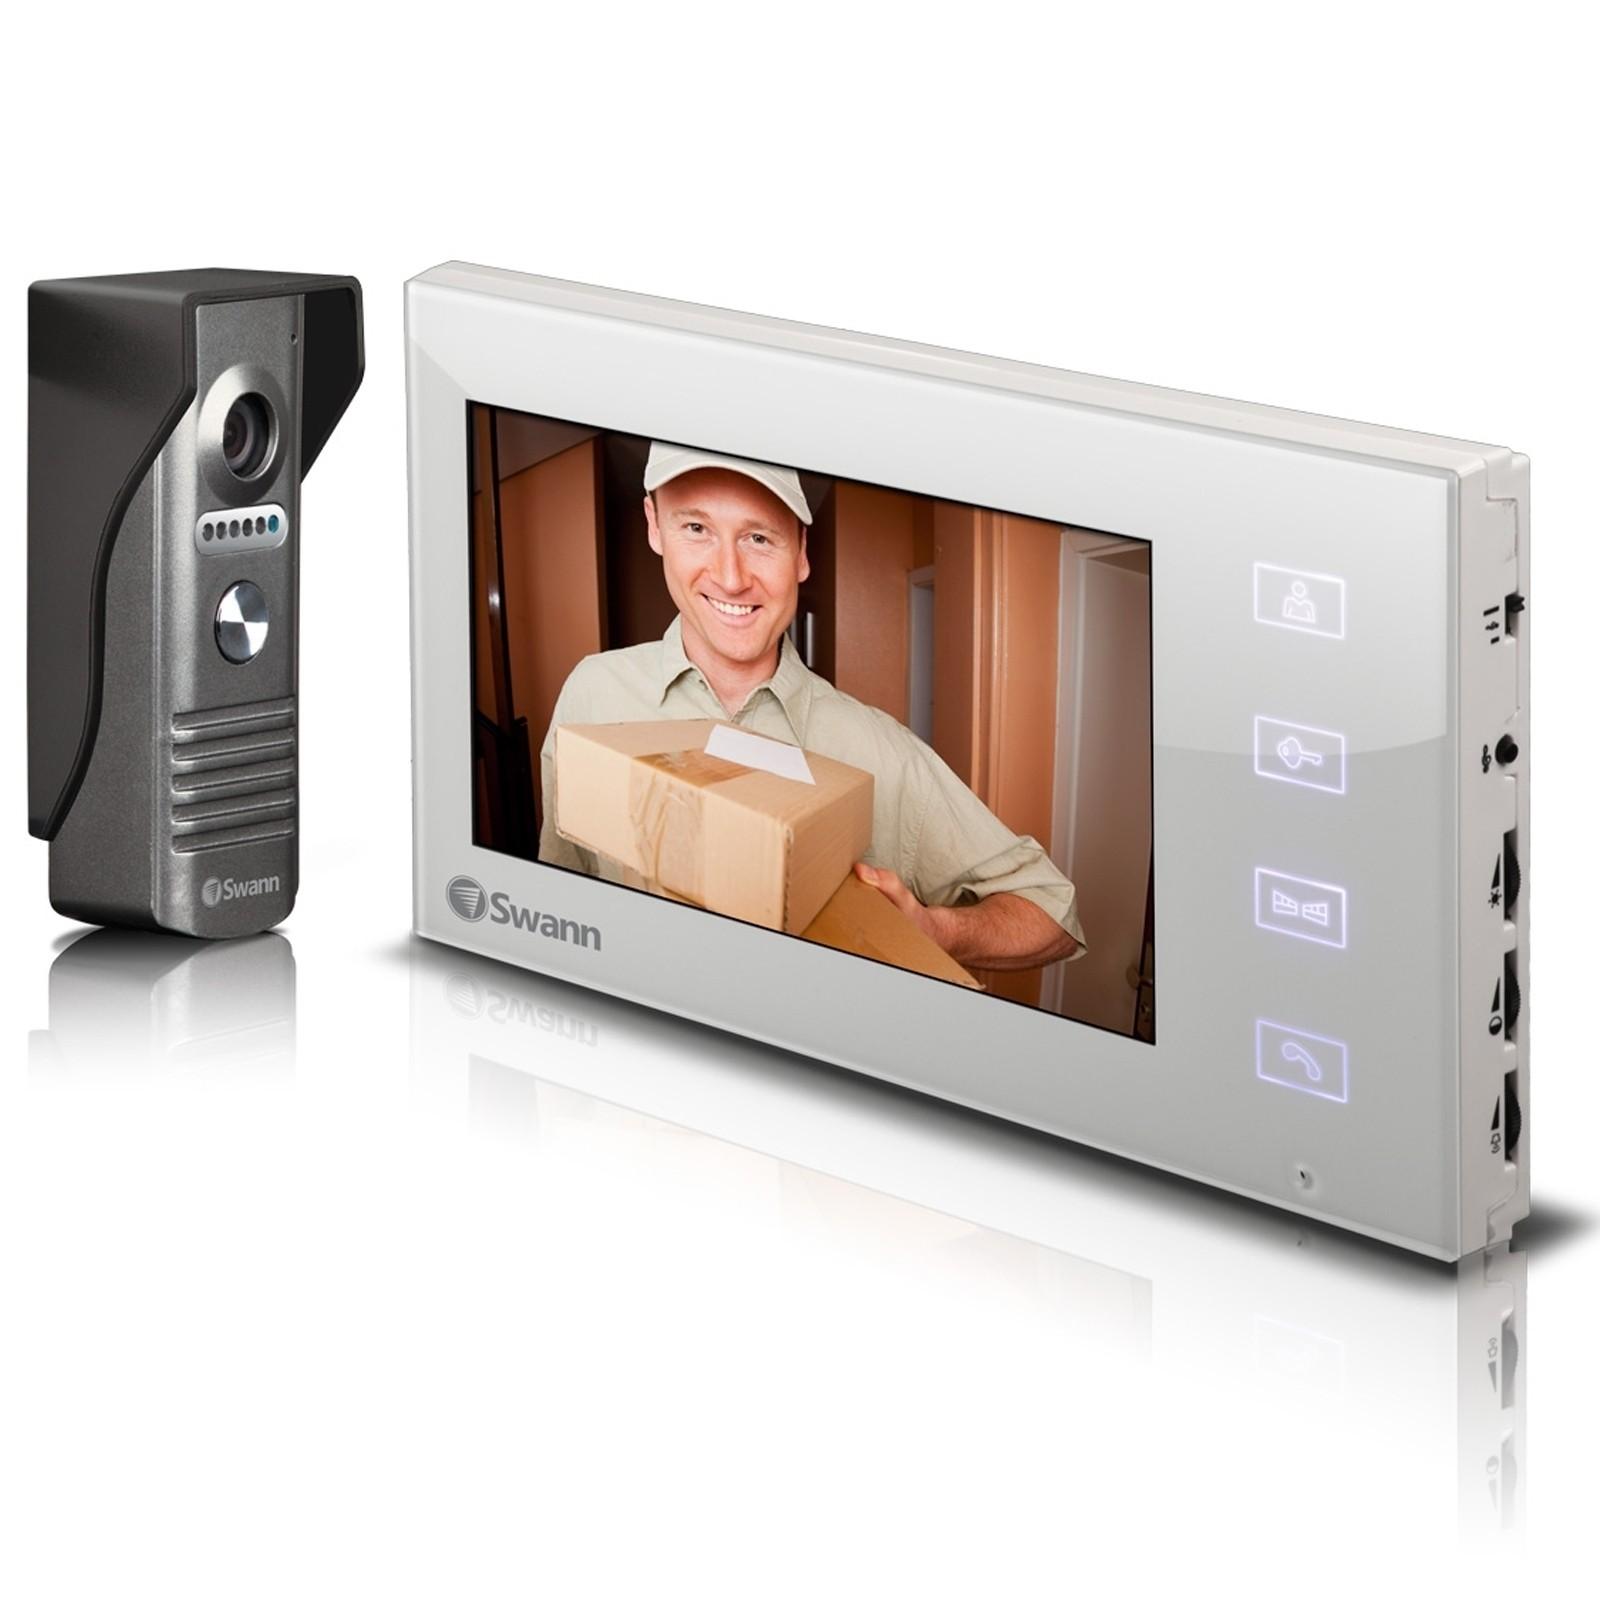 Futuro Intercom Wiring Diagram 30 Images Home Swann Swhom Dp880c Doorphone Video 7 Lcd Screen Door Lock Striker Release For